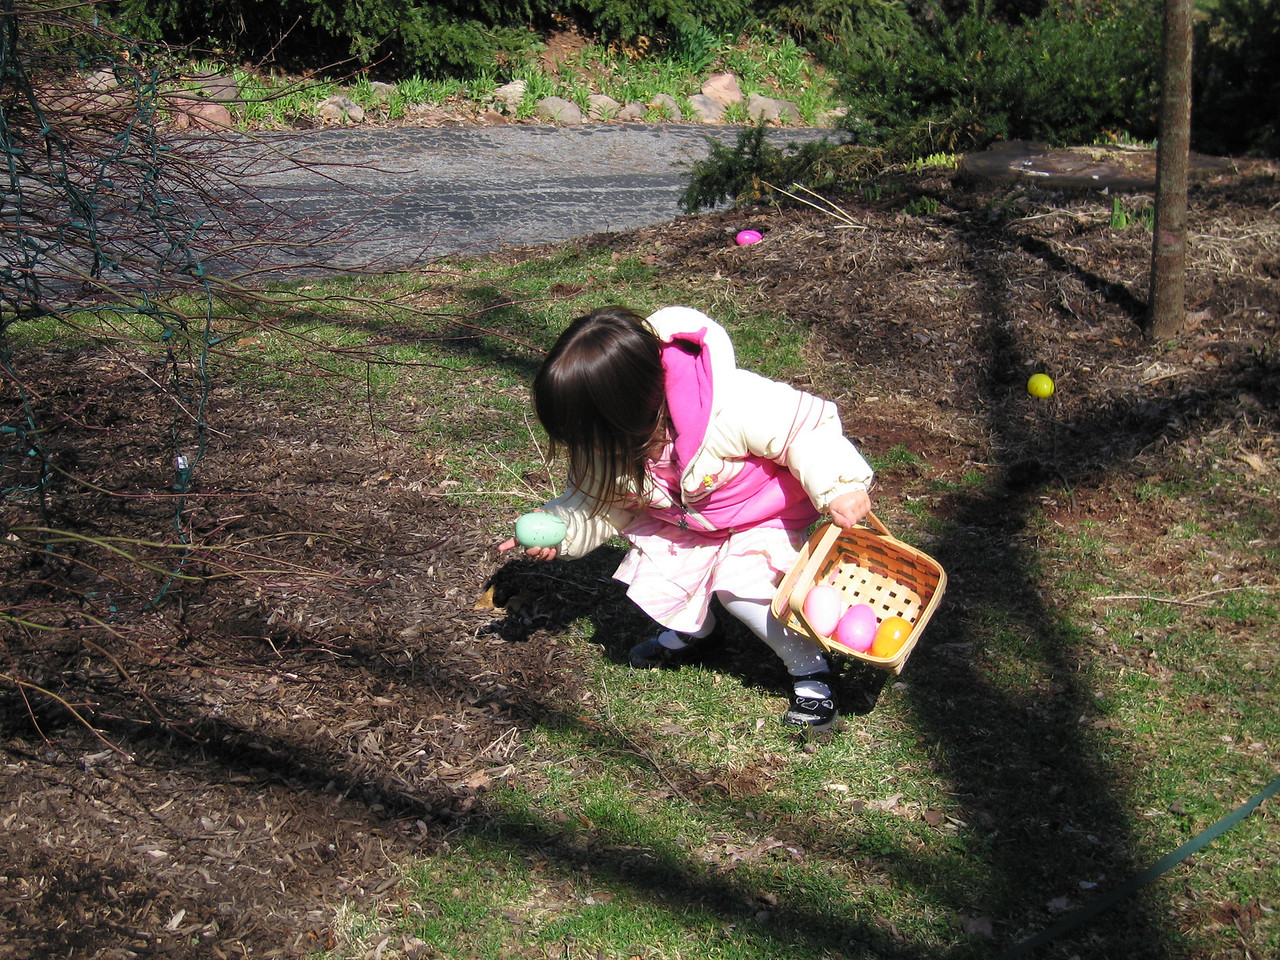 Kaidyn hunting Easter Eggs